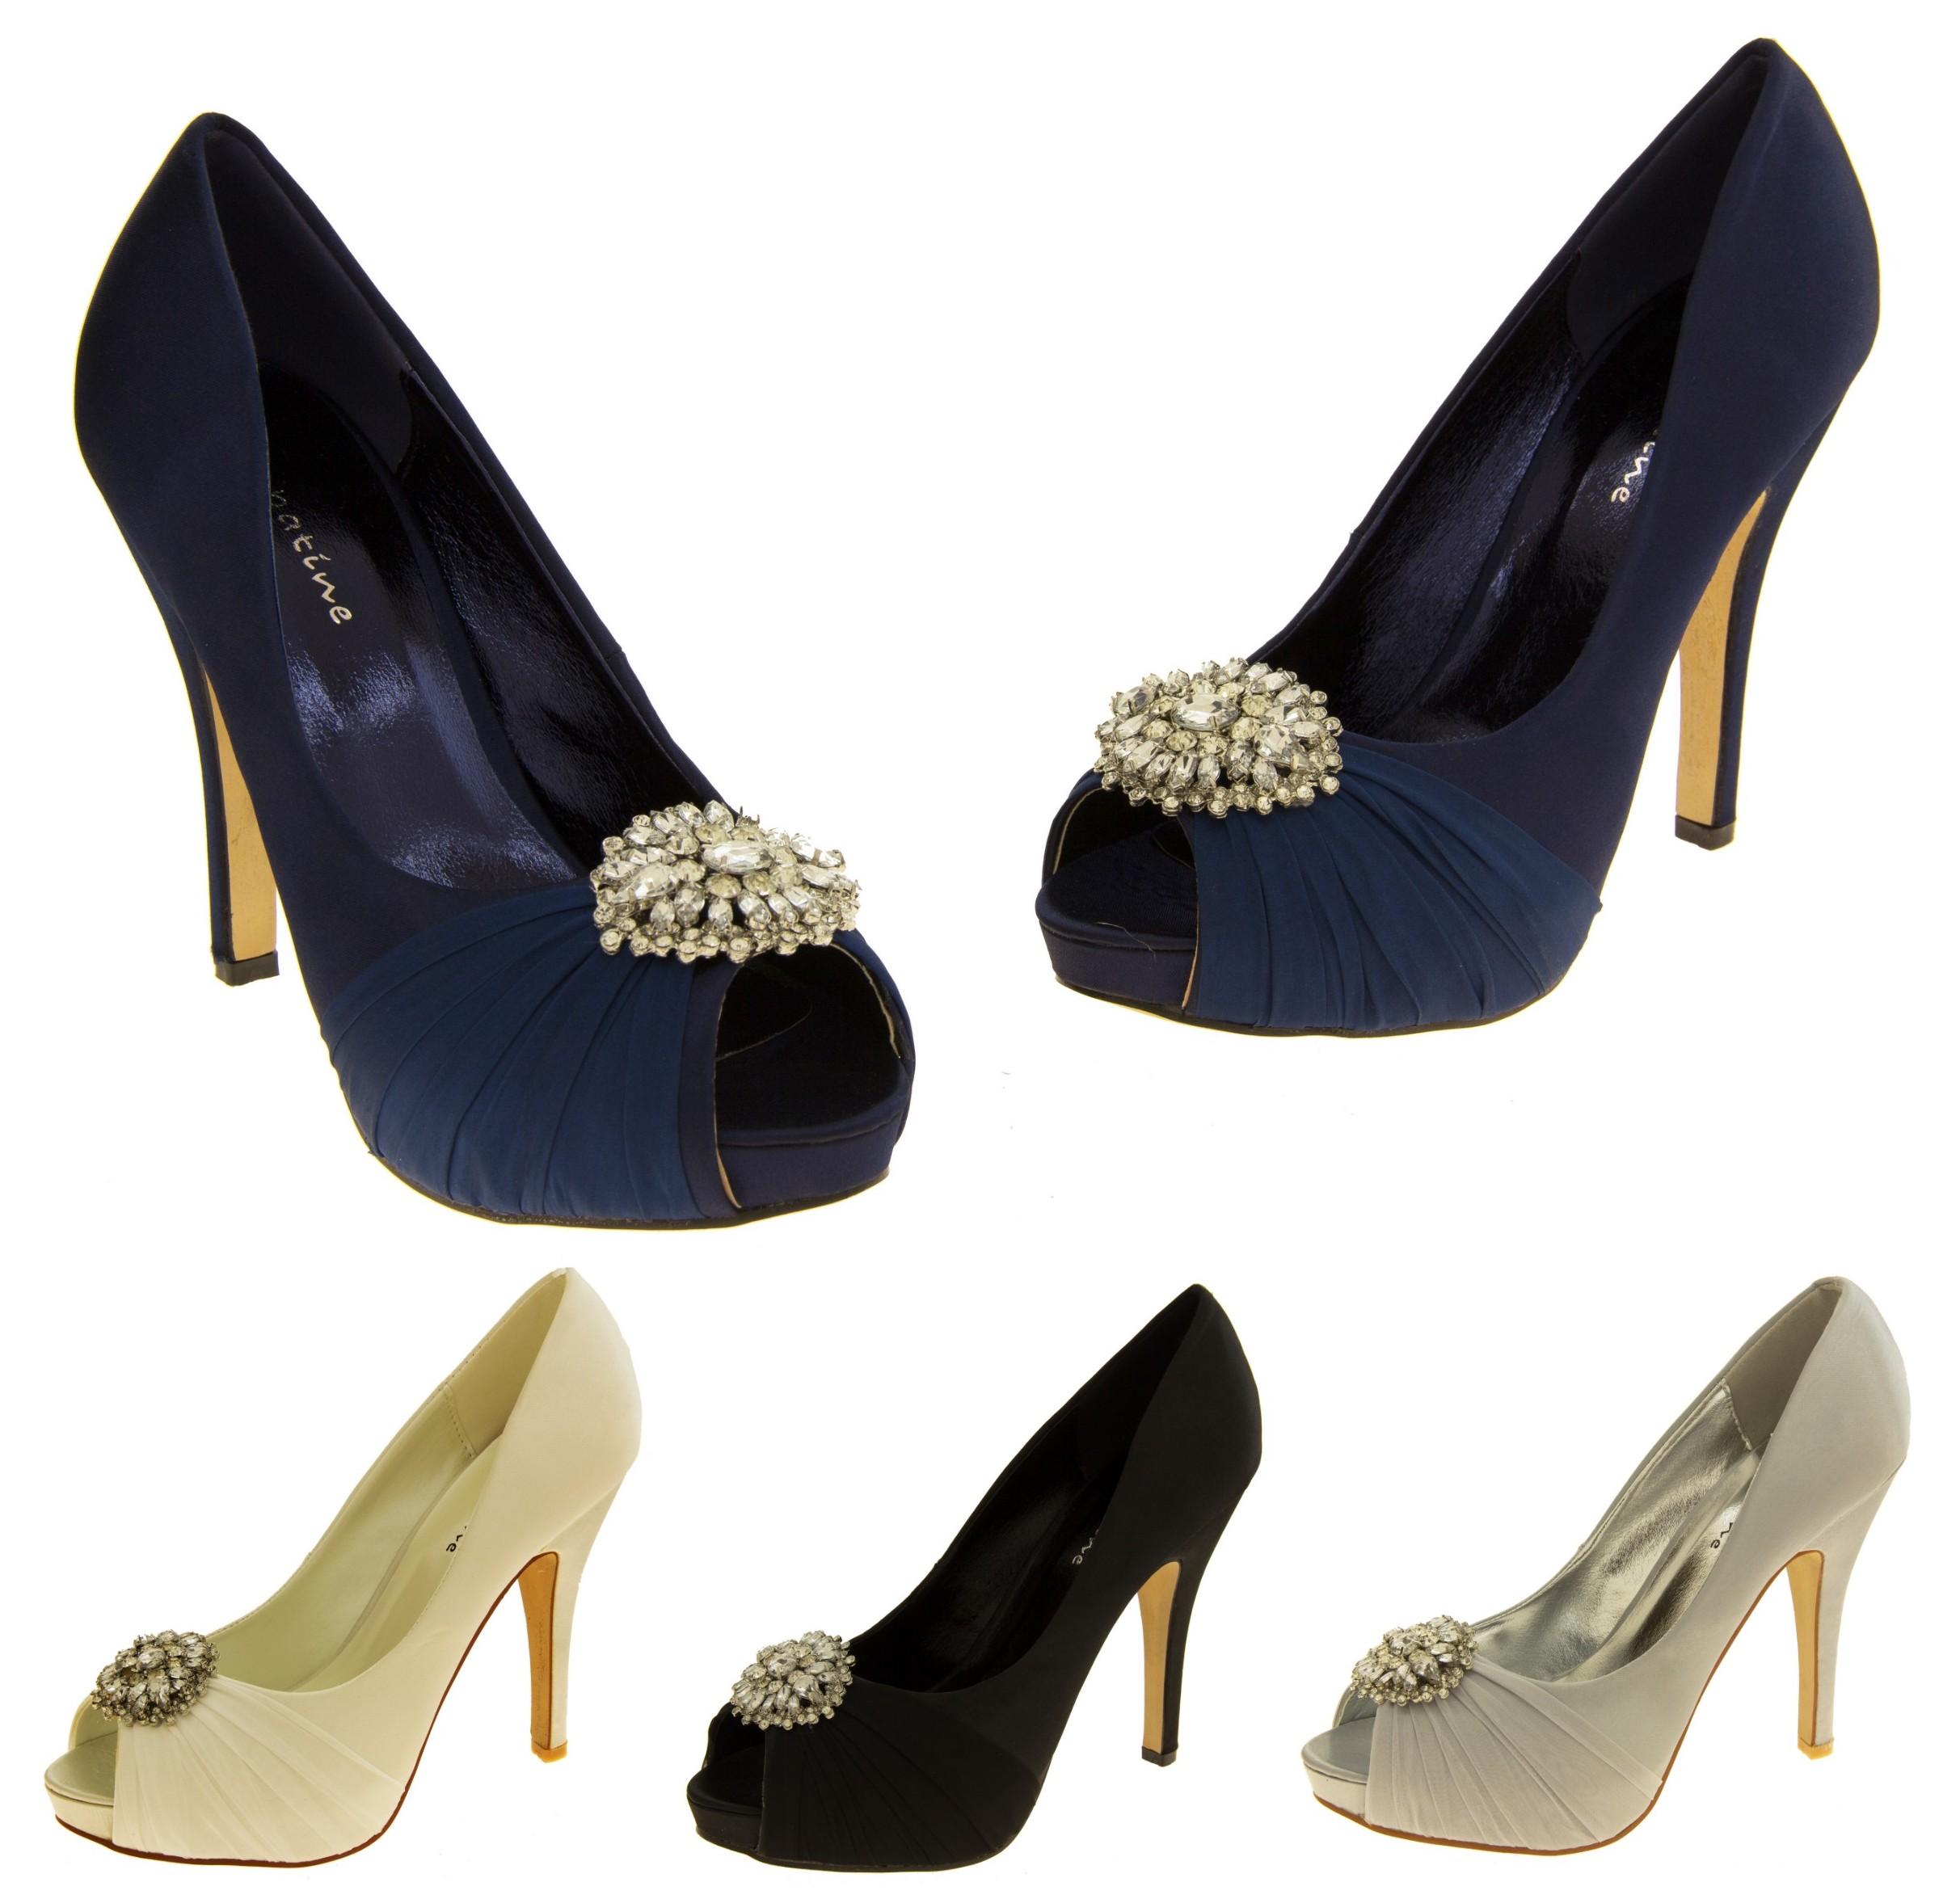 91766a4c26683 Details about Ladies Satin SABATINE Diamante Brooch Bridal Wedding Shoes  Sizes 3 4 5 6 7 8